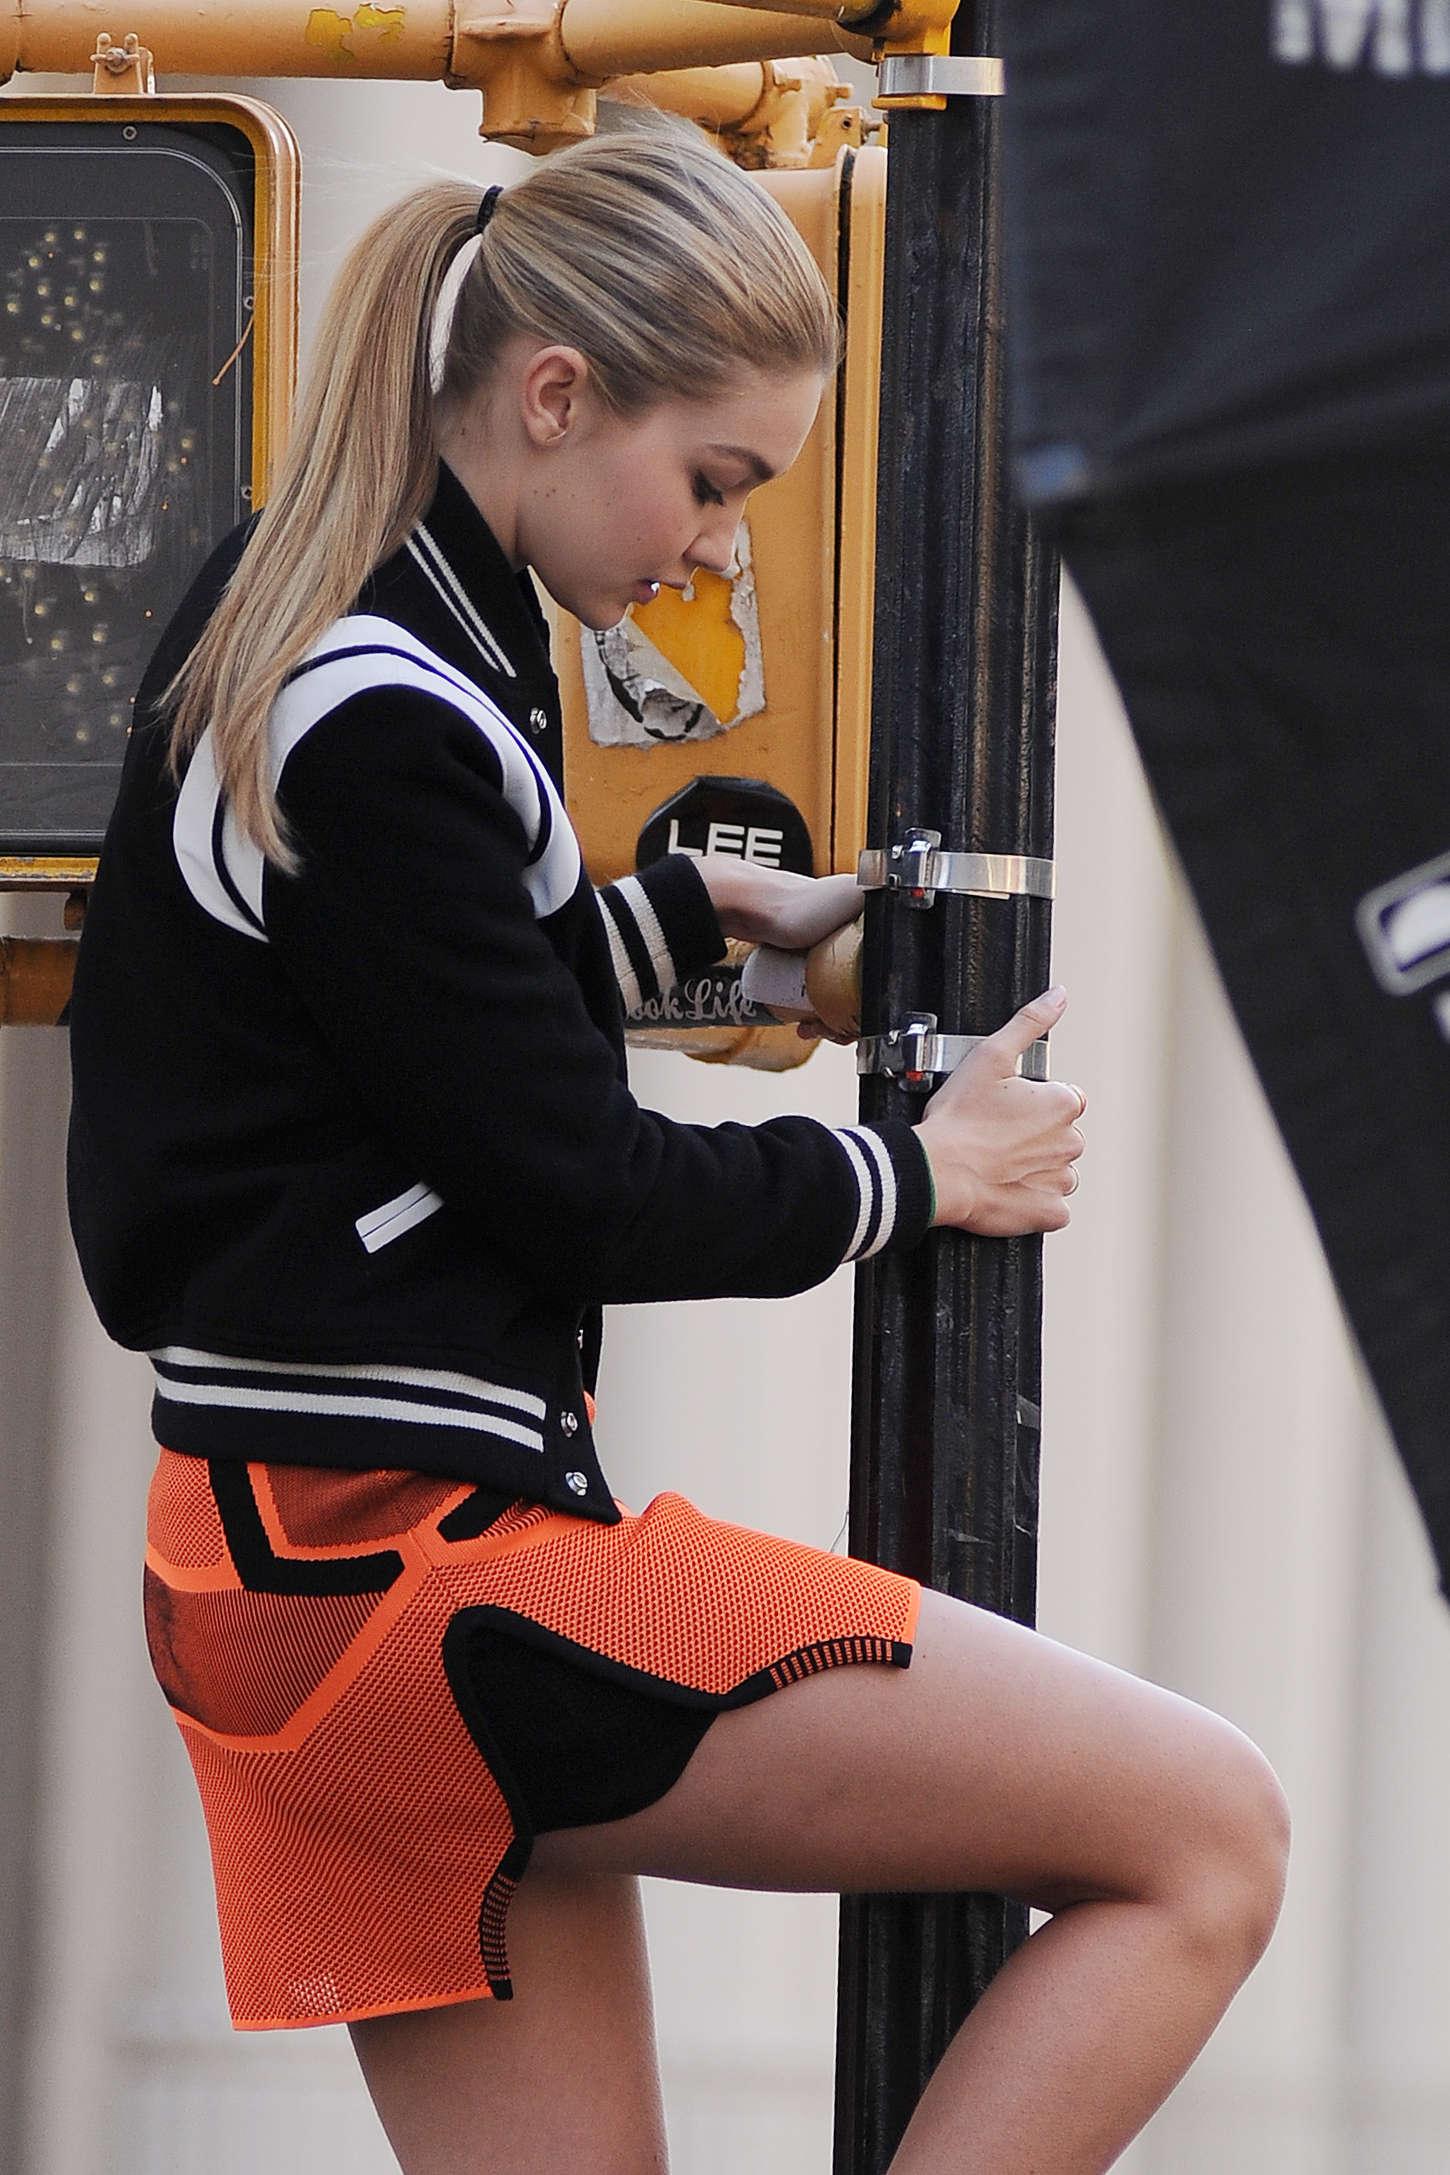 Christian Wallpapers For Girls Gigi Hadid In Orange Mini Skirt On Photoshoot In Nyc